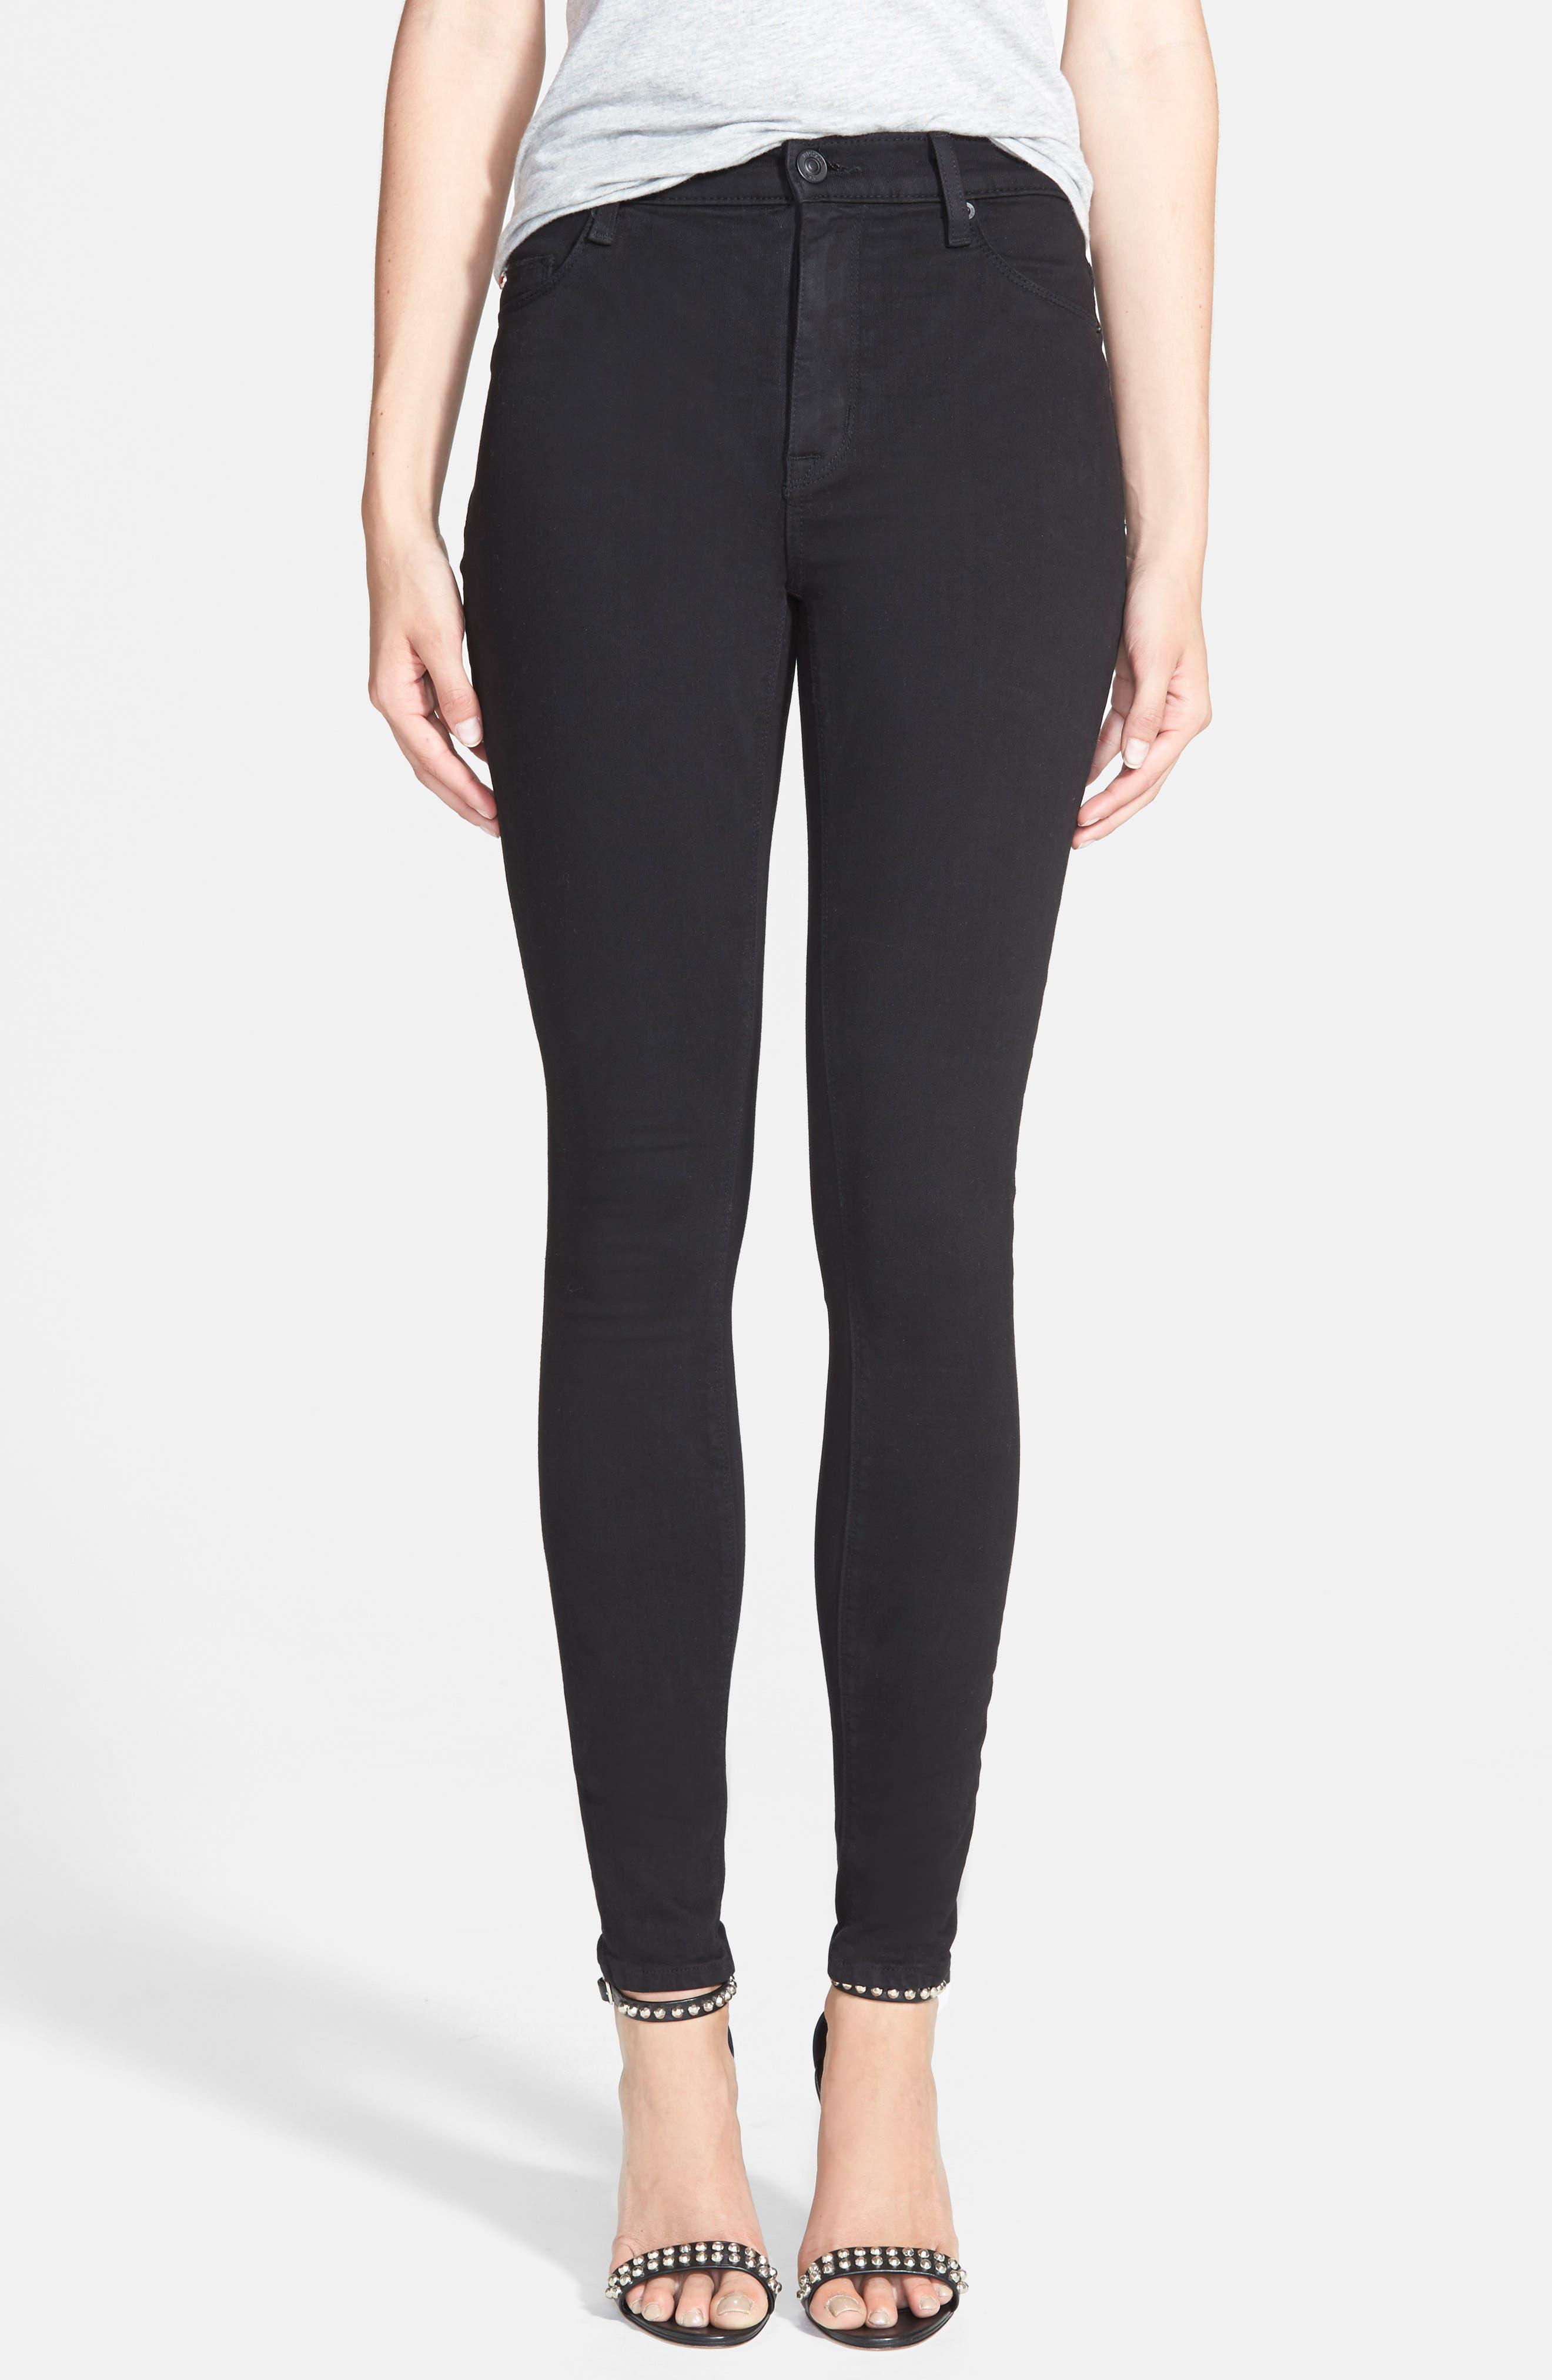 Barbara High Waist Skinny Jeans,                             Main thumbnail 1, color,                             001